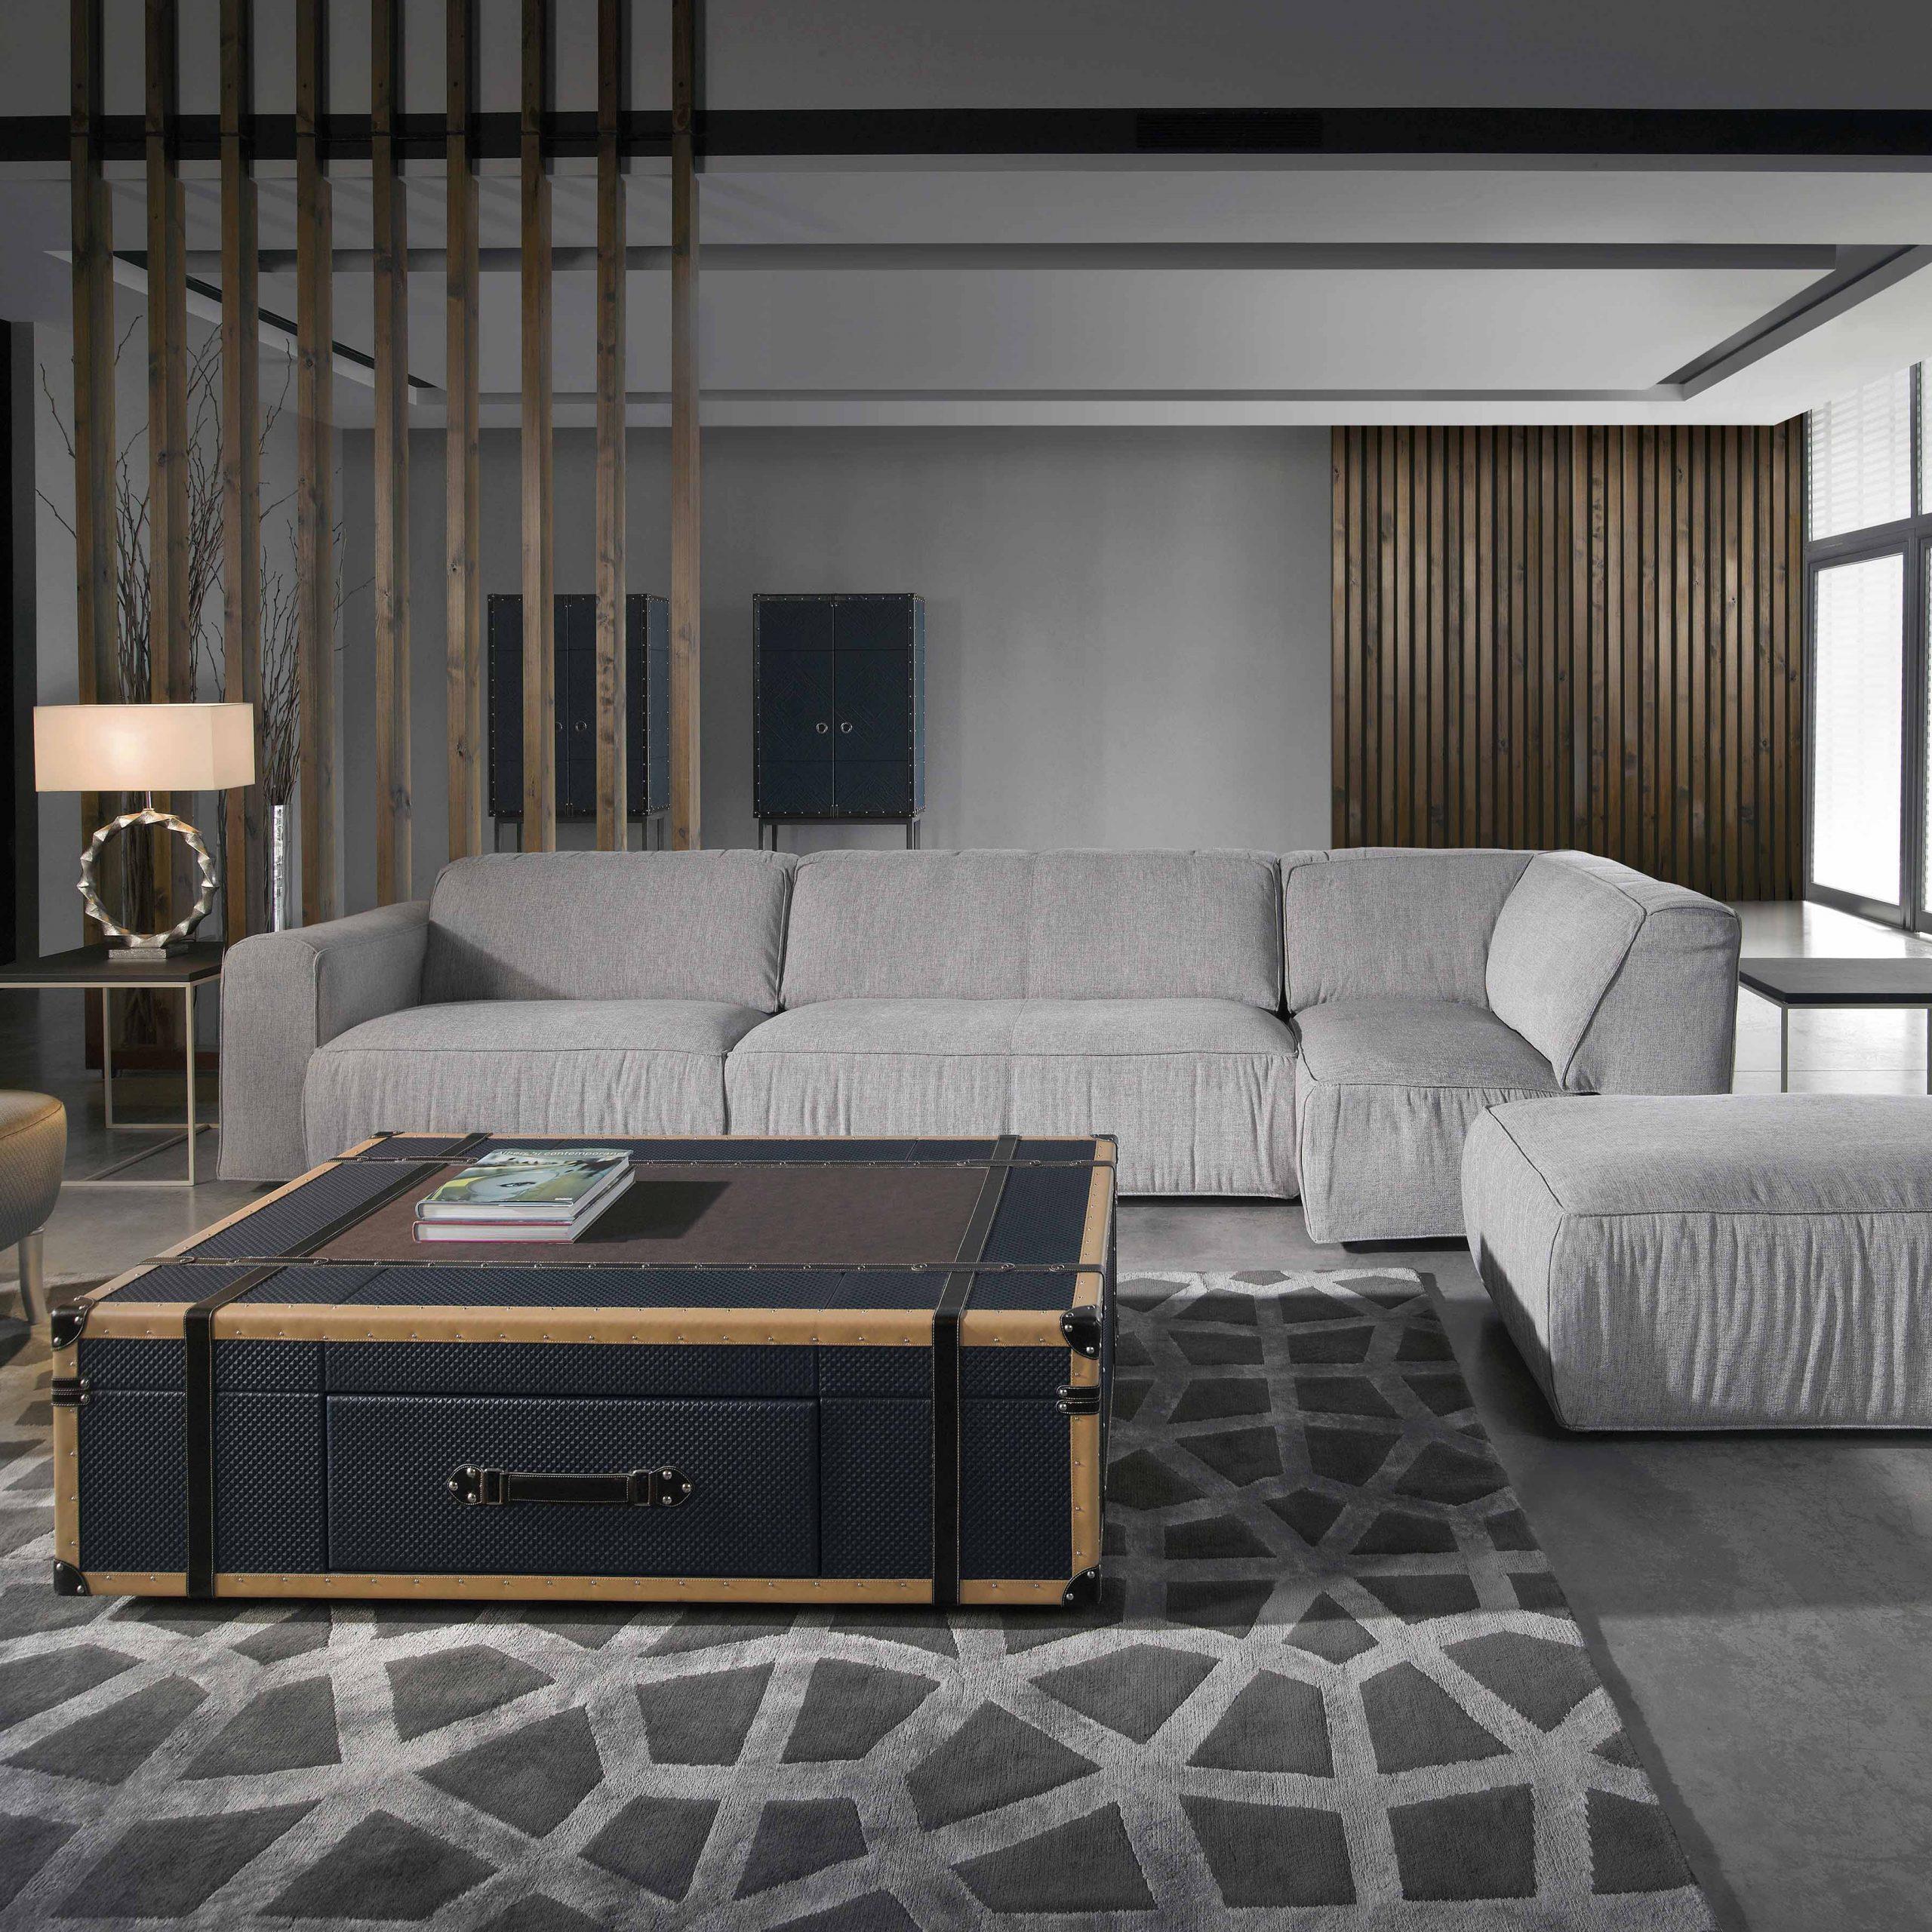 Luxury Sofas & Designer Sofas Inside Fancy Sofas (View 3 of 15)